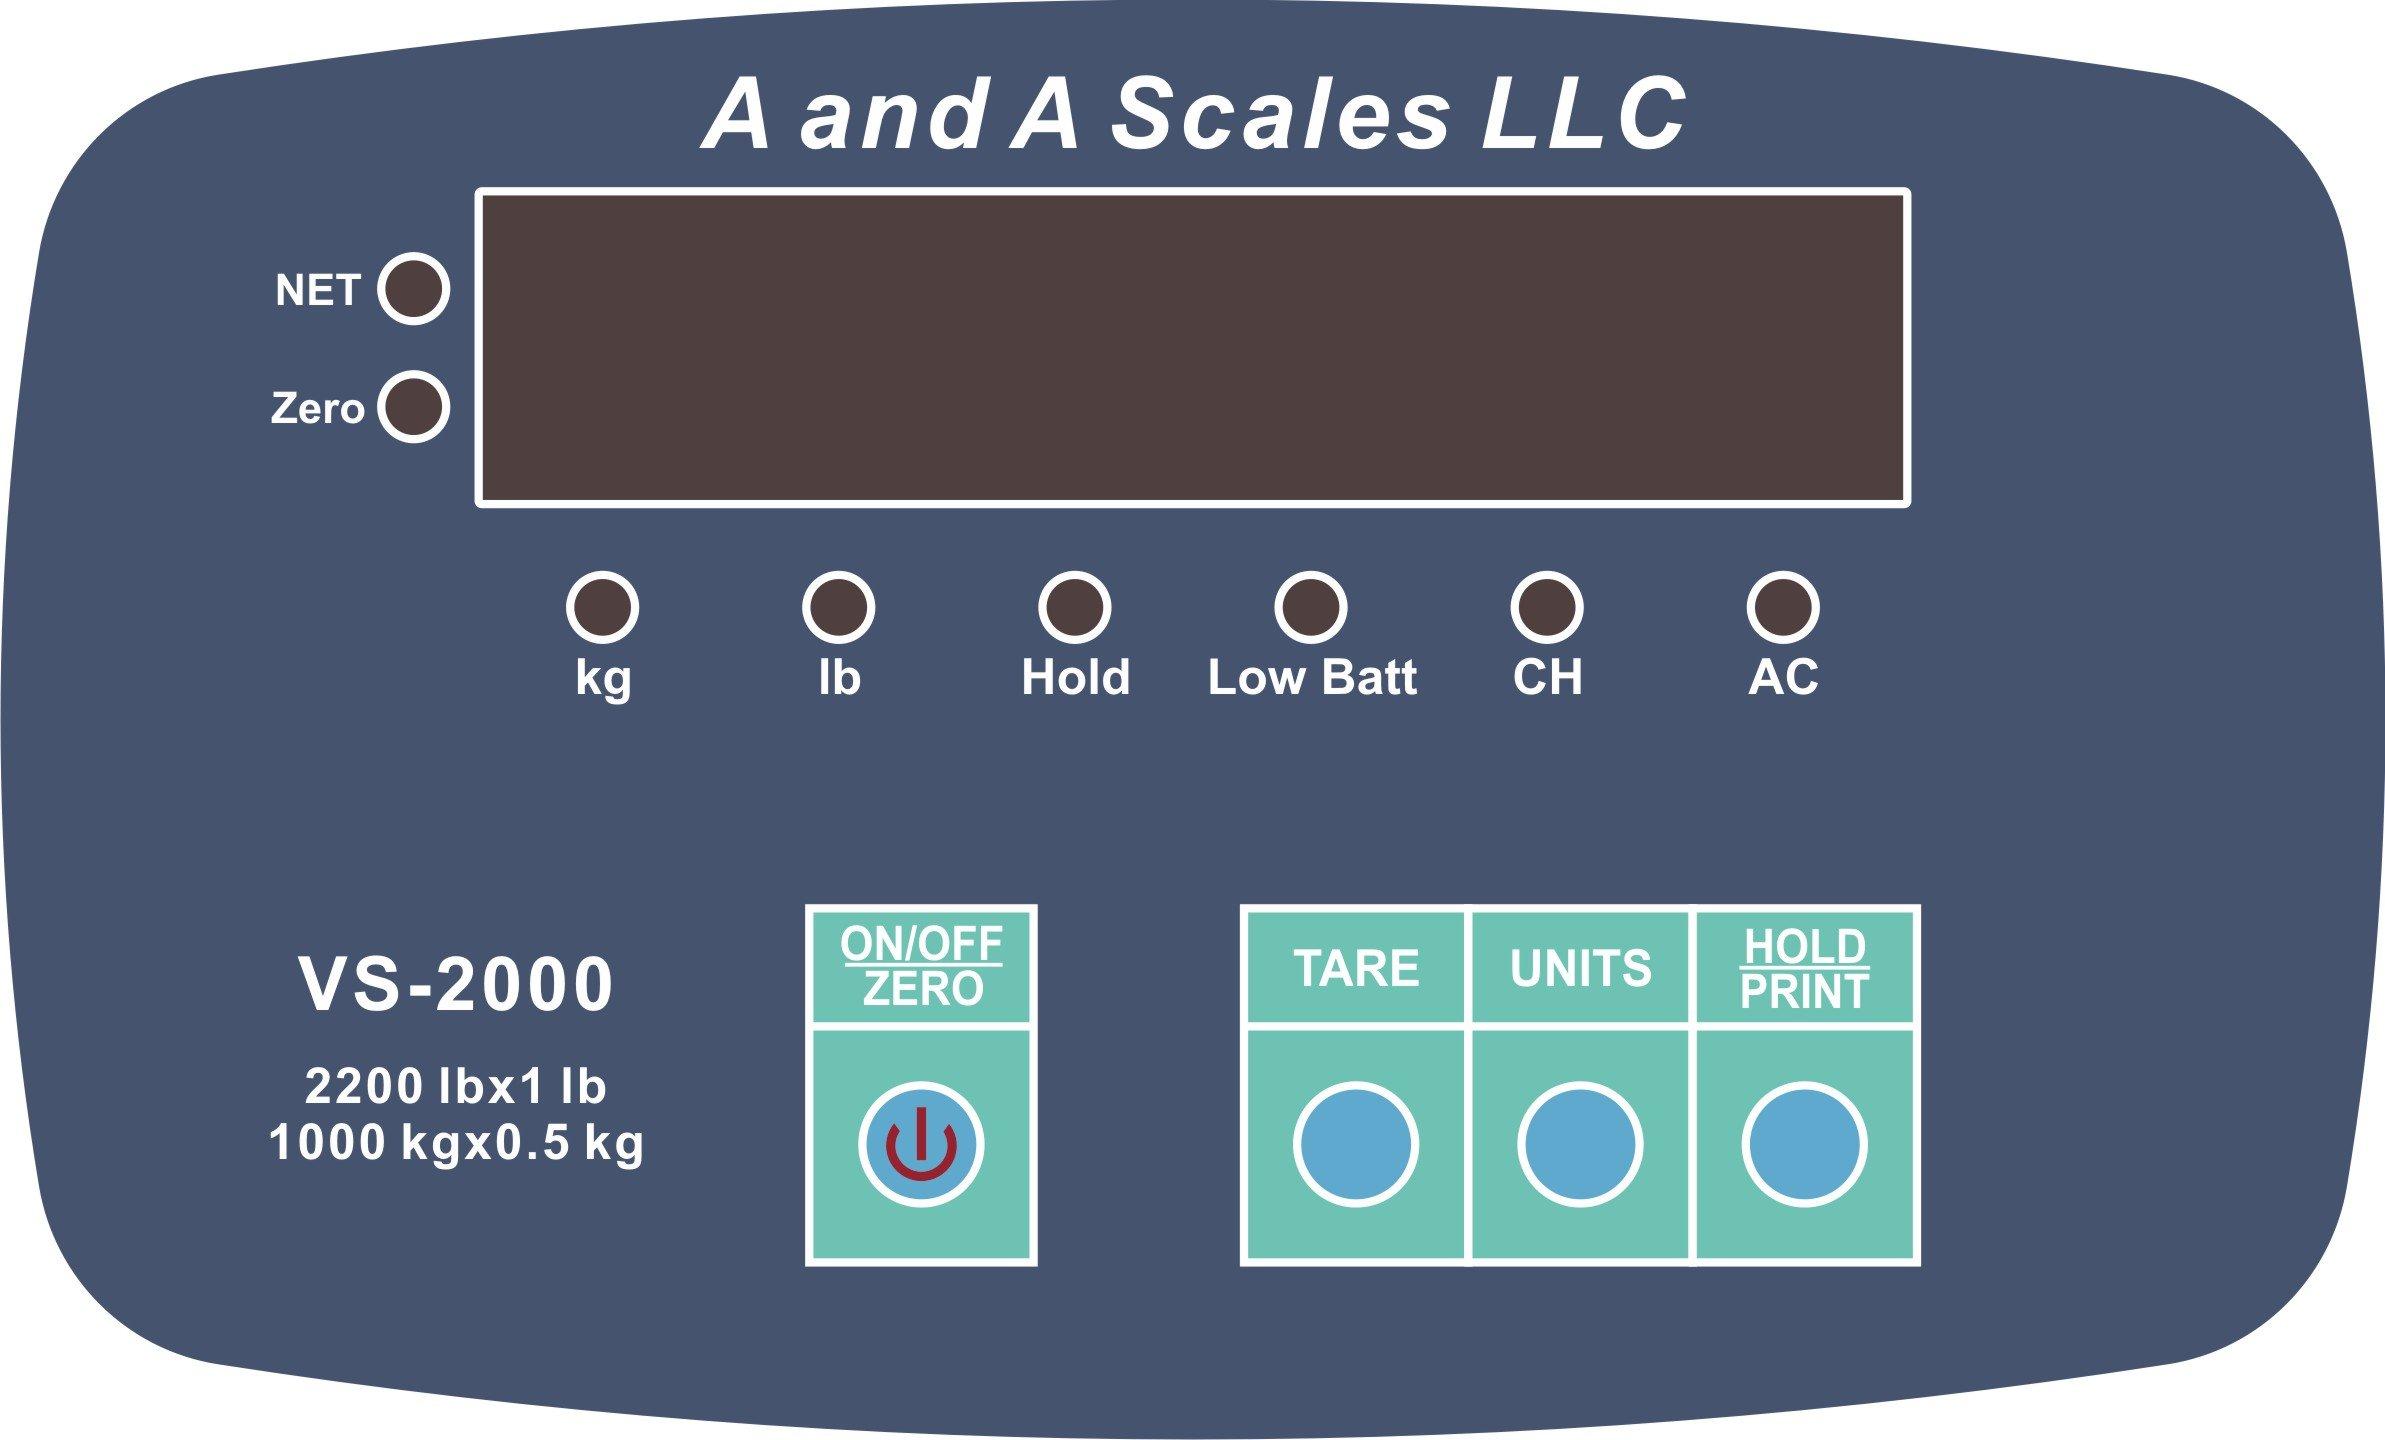 VS-2200 livestock cattle scale hog goat alleyway scale